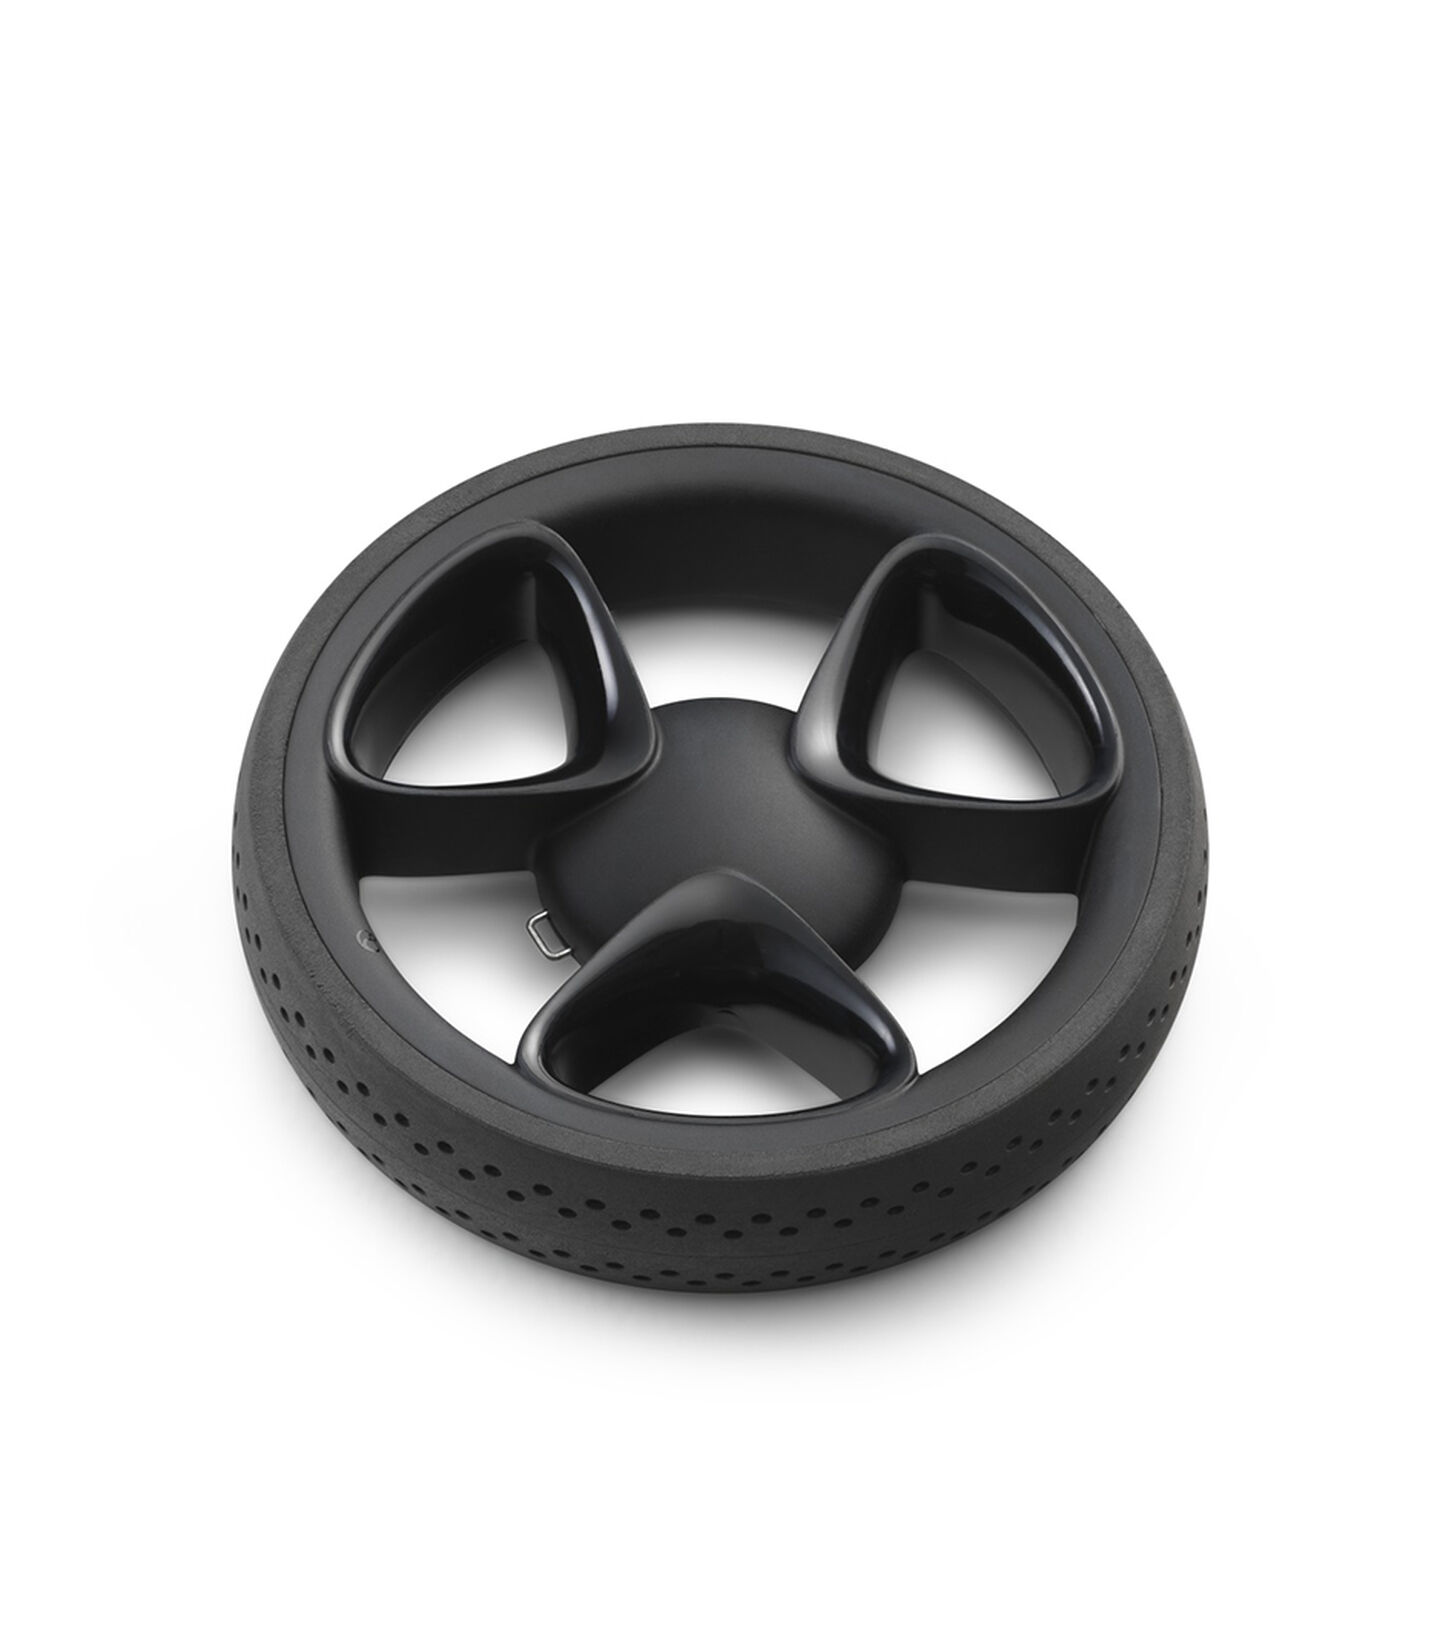 Stokke® Xplory® Back wheel complete Black, Black, mainview view 1